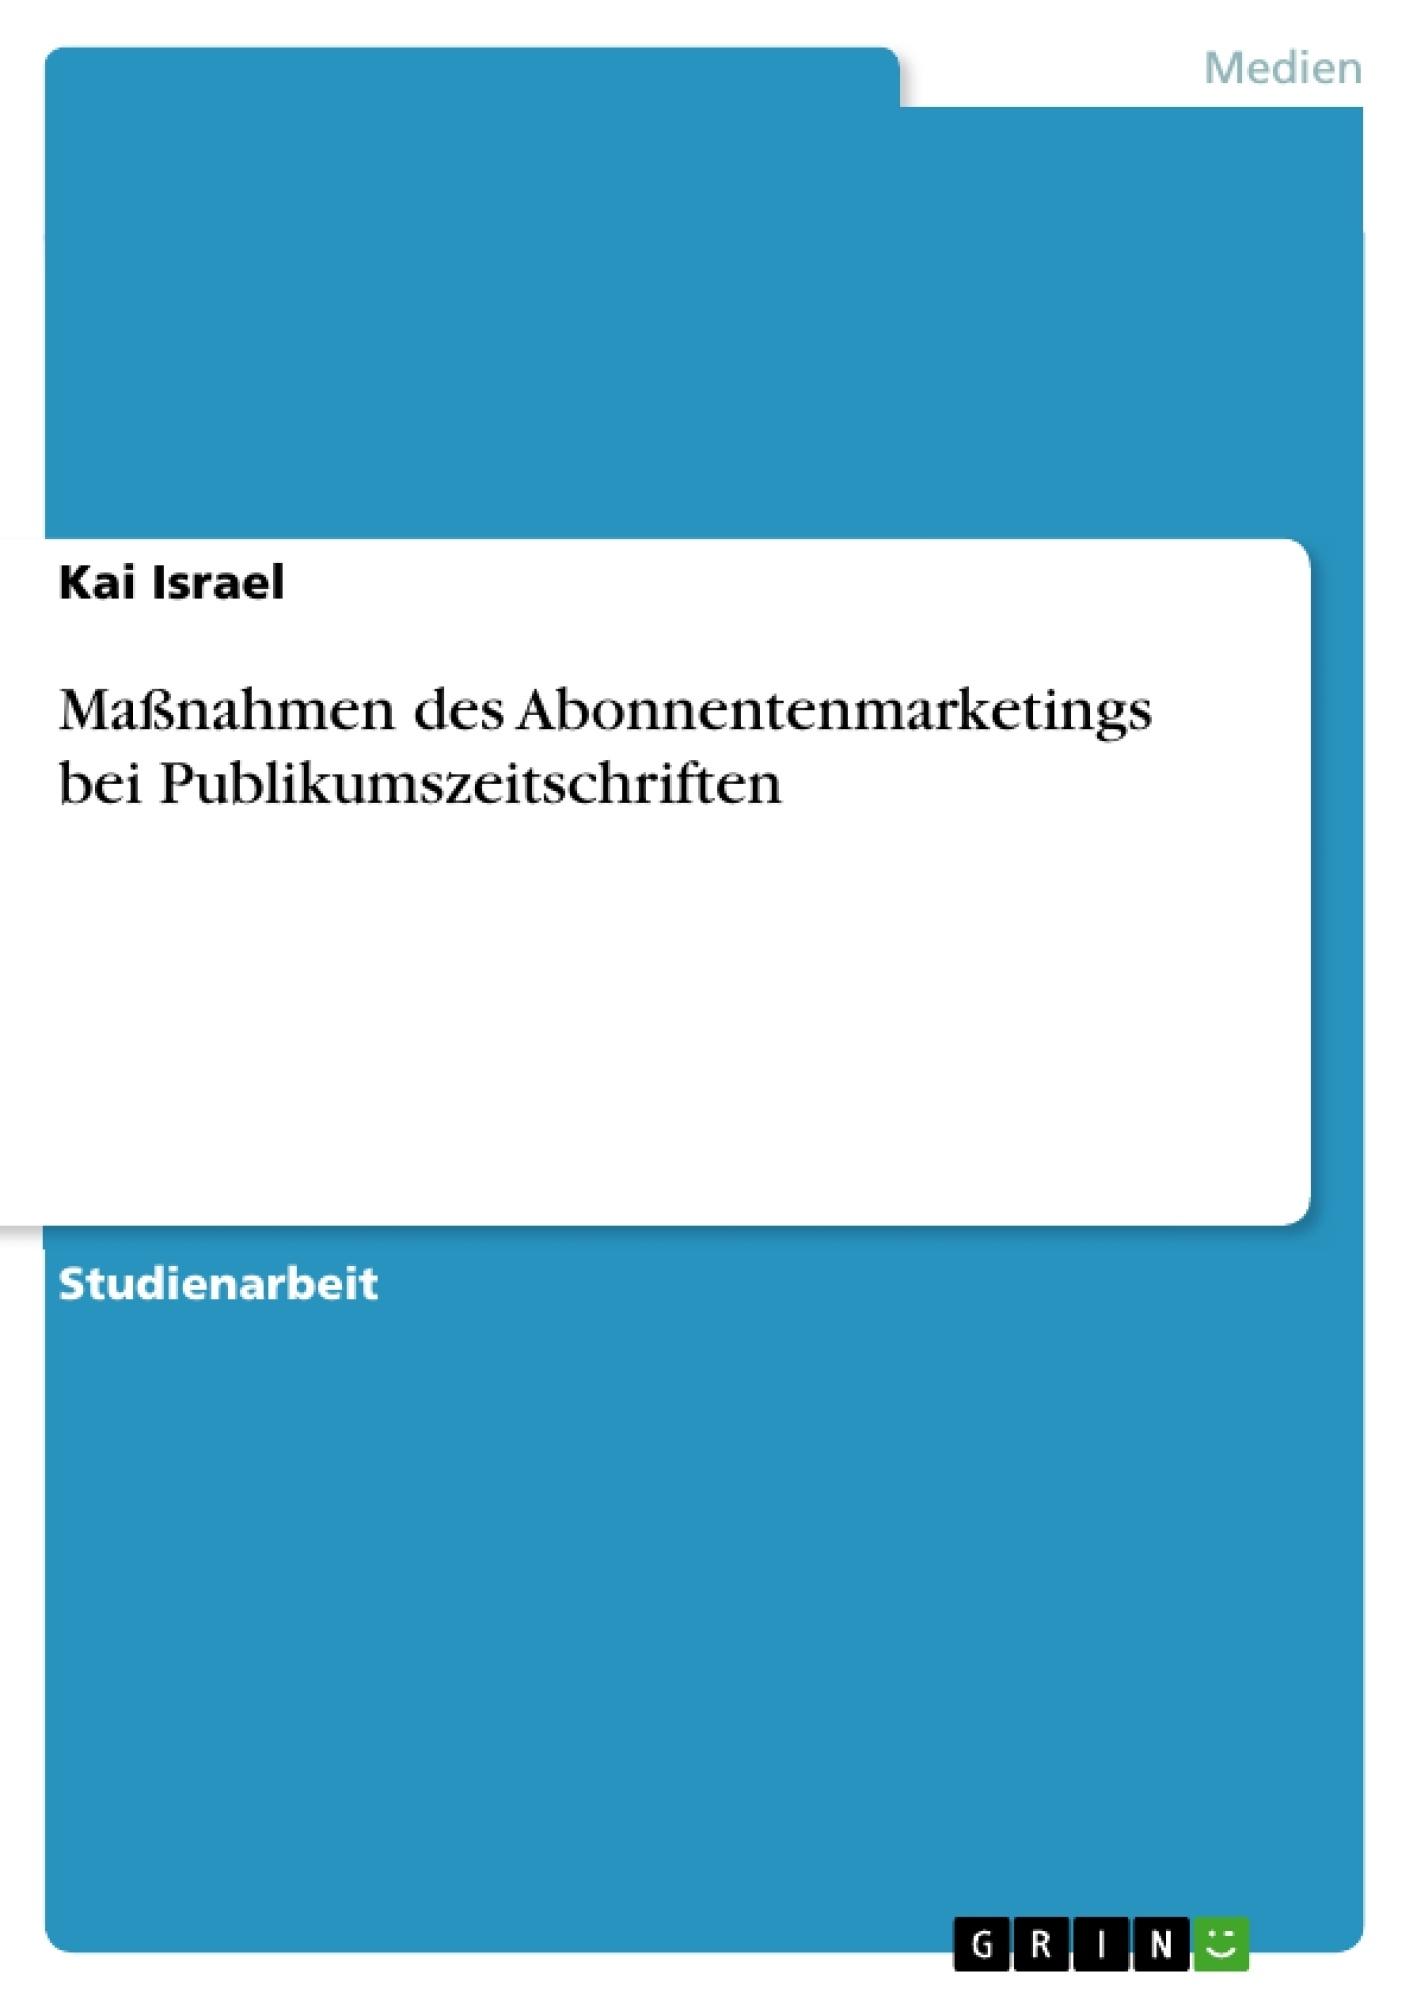 Titel: Maßnahmen des Abonnentenmarketings bei Publikumszeitschriften